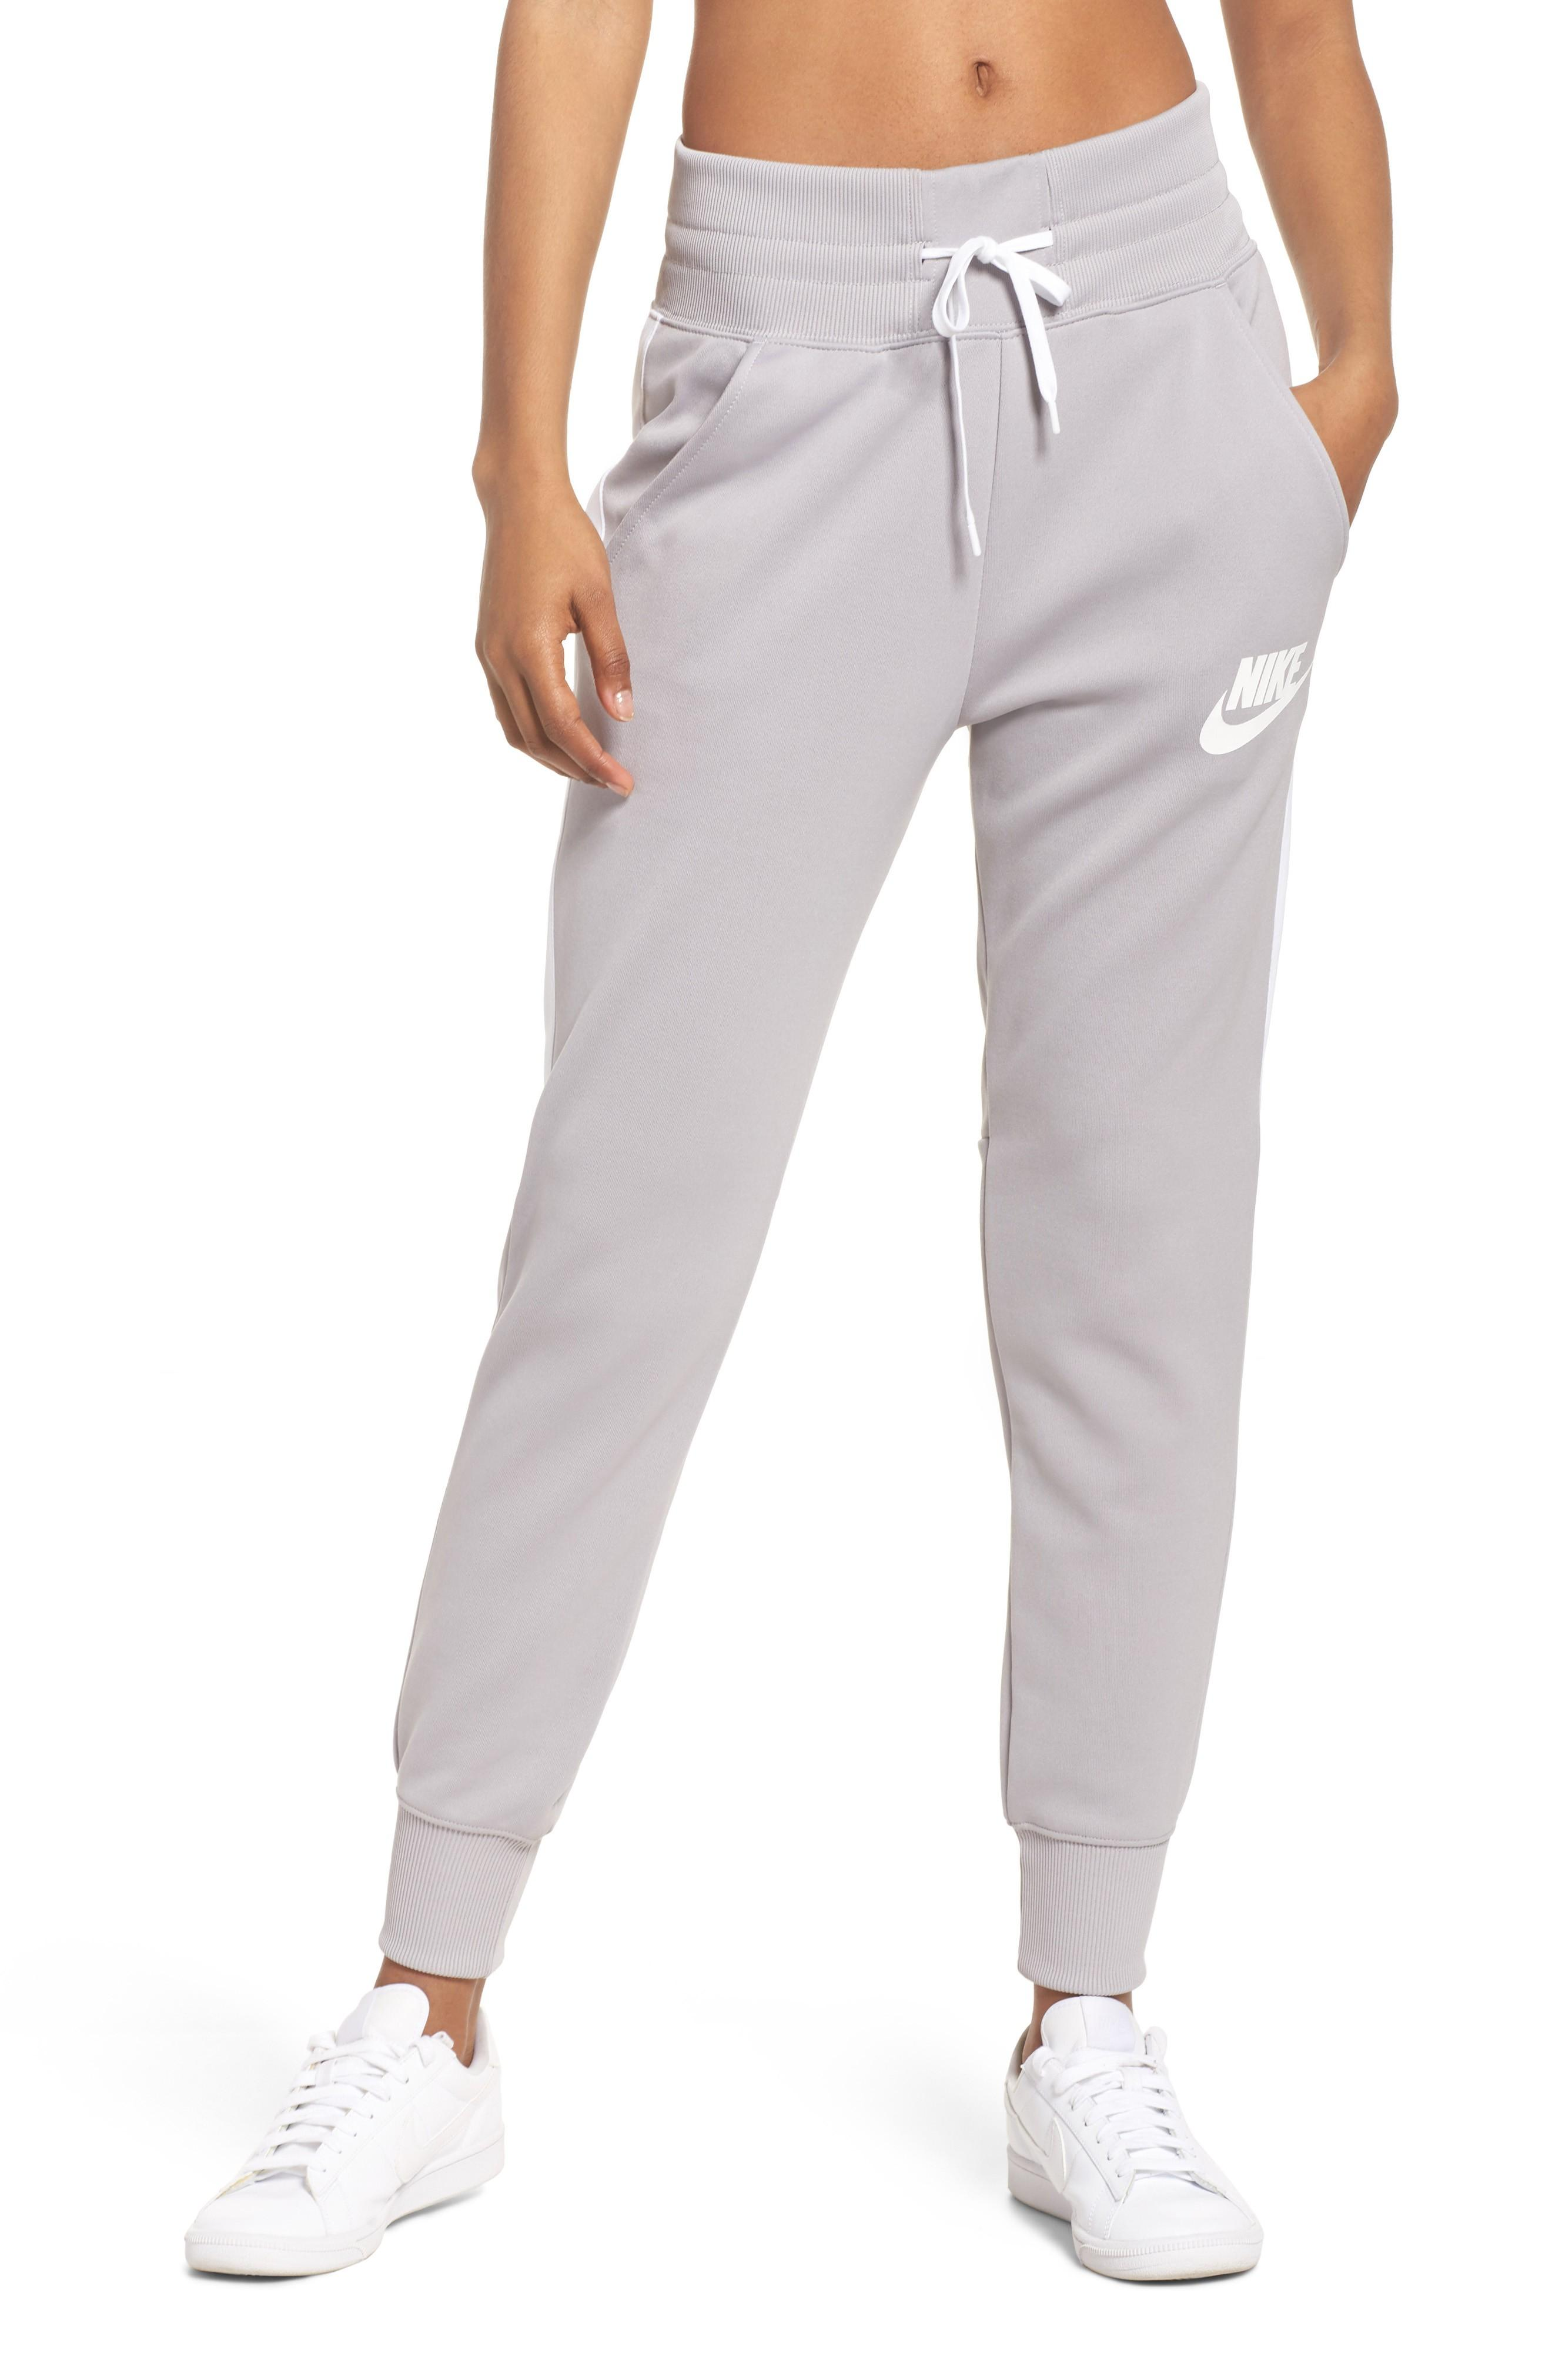 5ffe42abec4e Nike Sportswear Jogger Pants In Atmosphere Grey  White